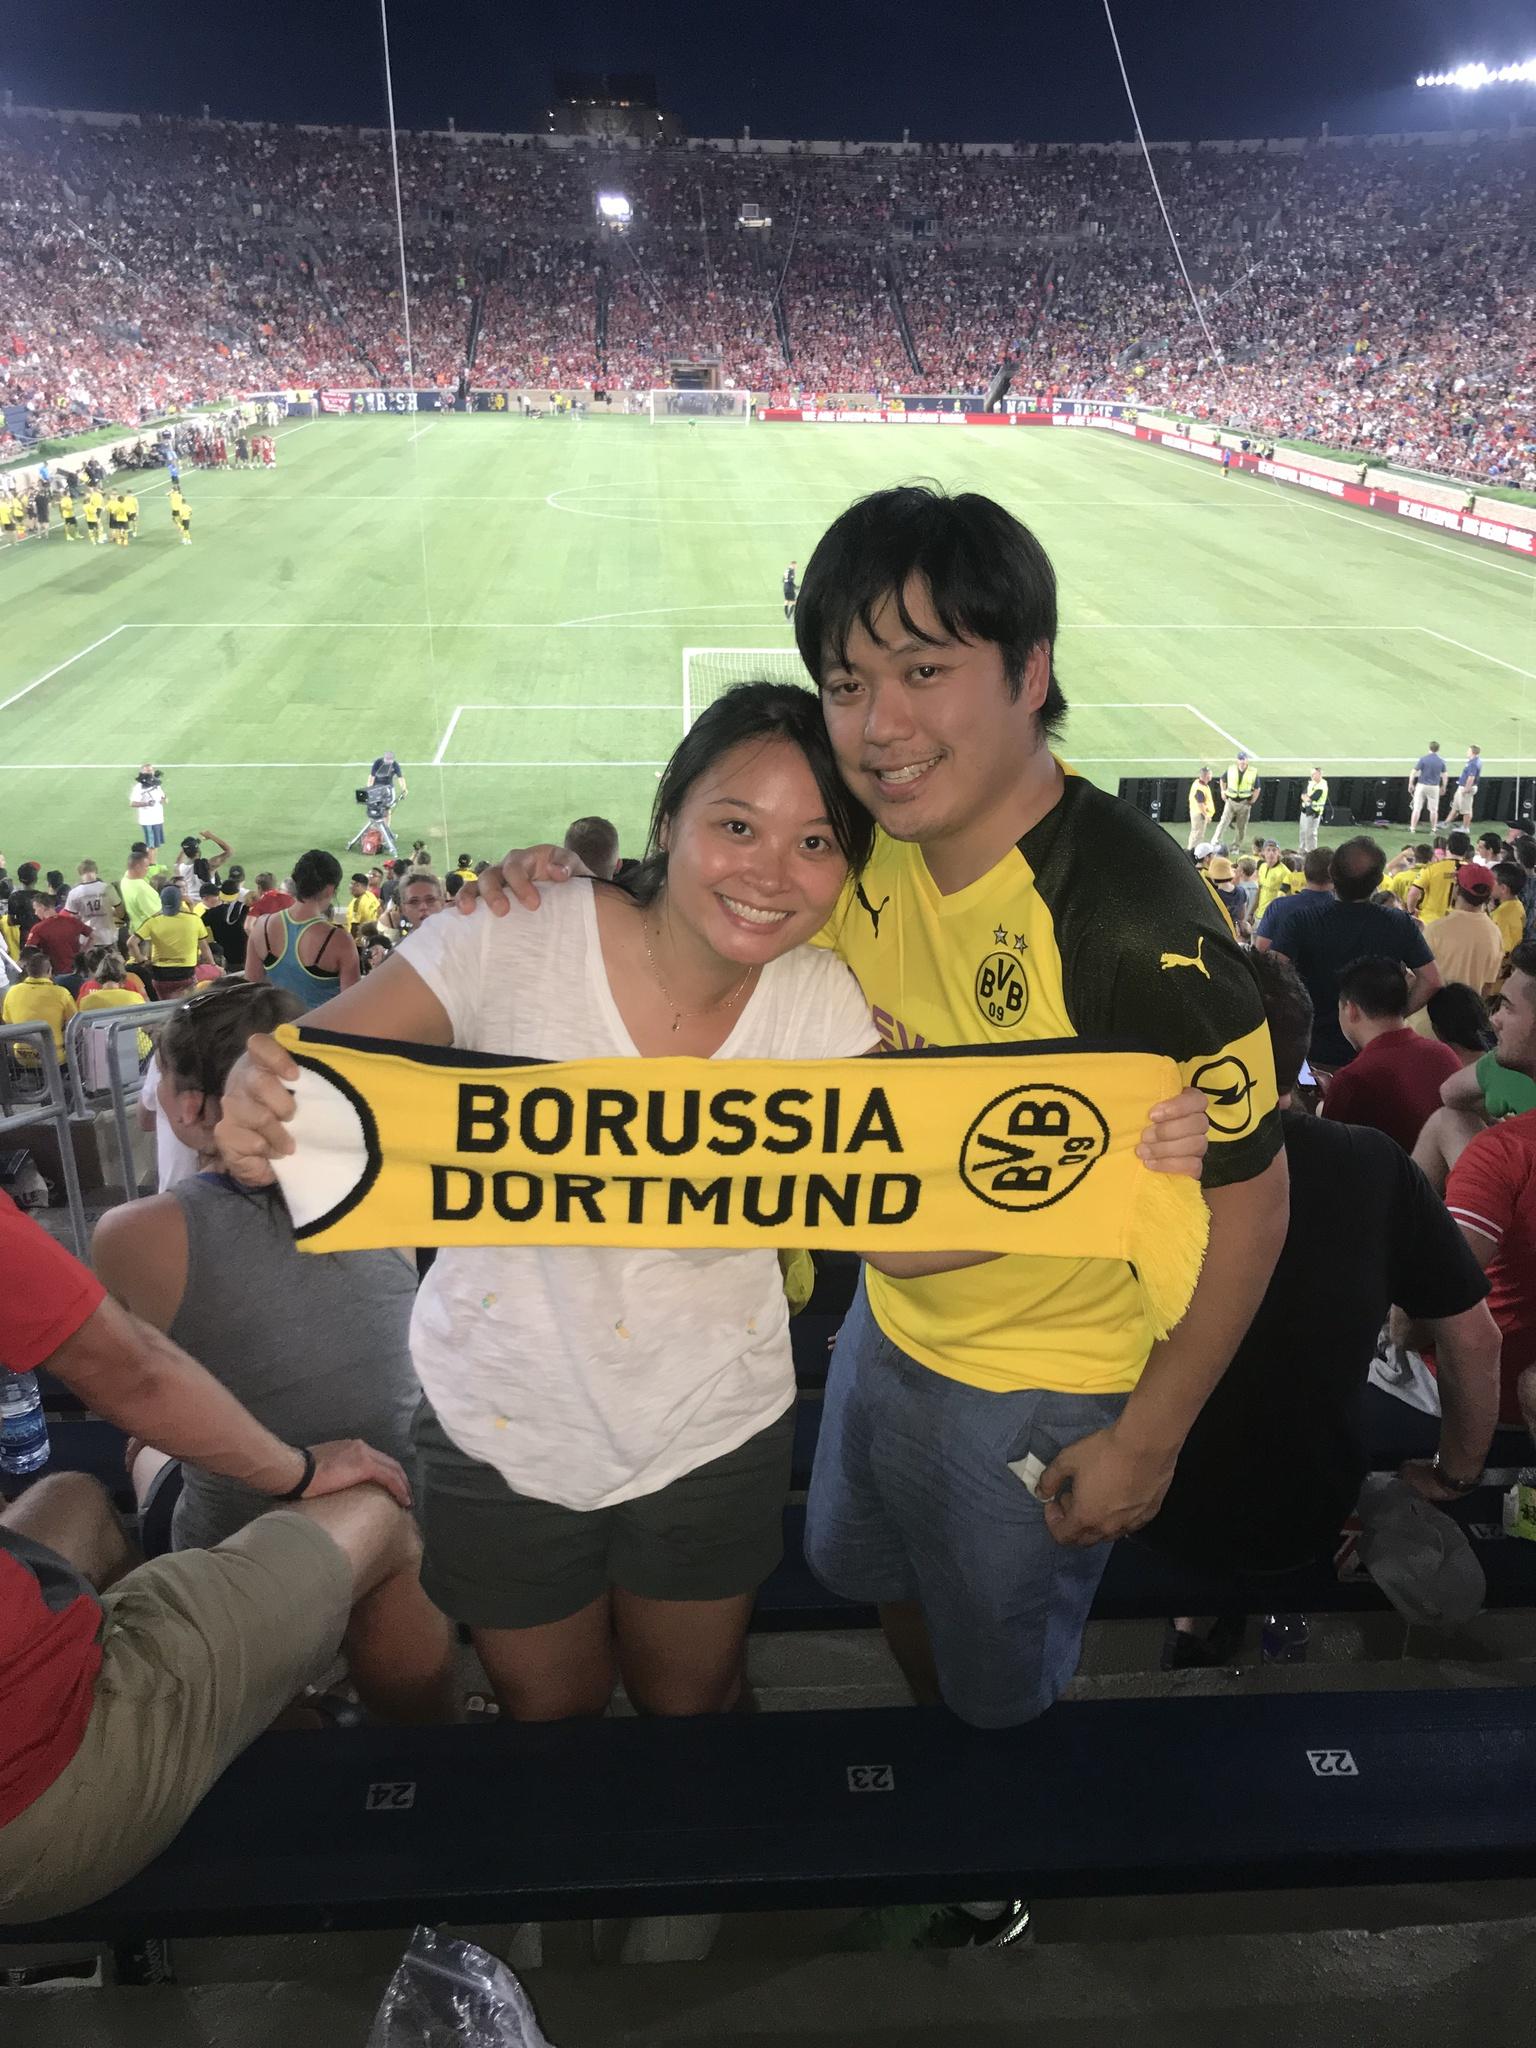 Enjoying a Dortmund friendly in Notre Dame Stadium